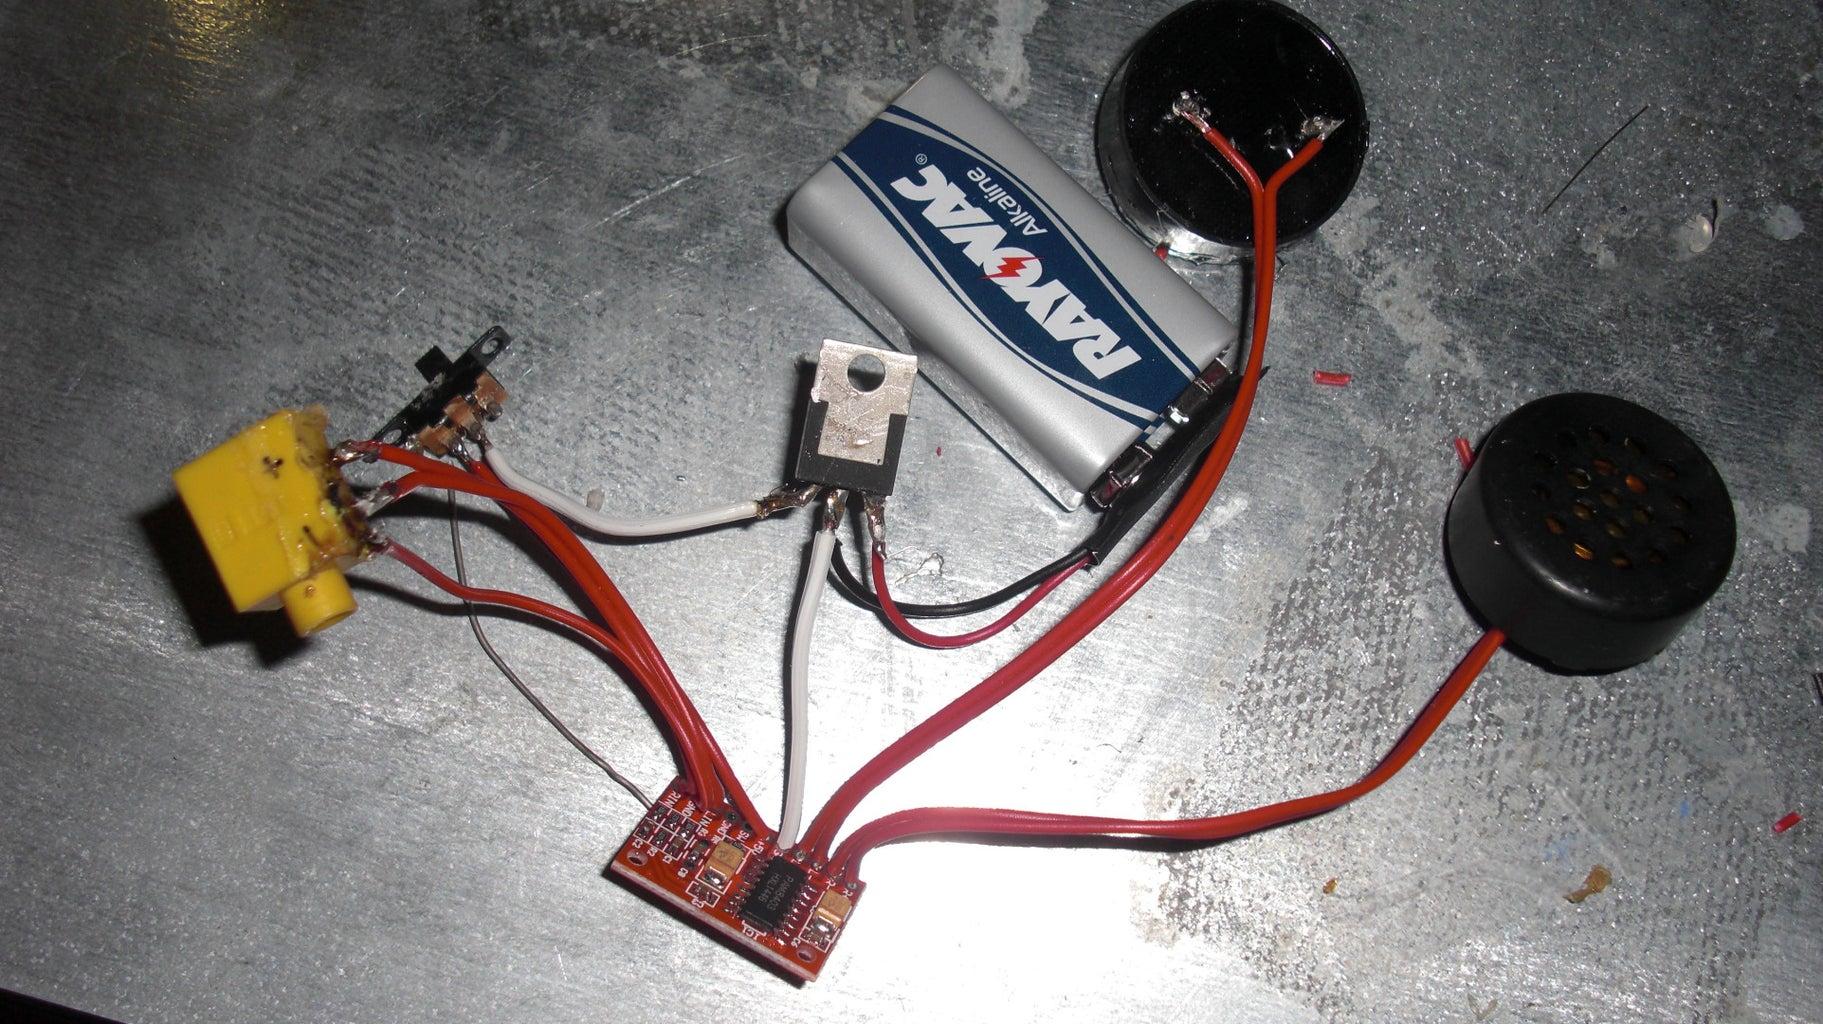 Powering the Speaker